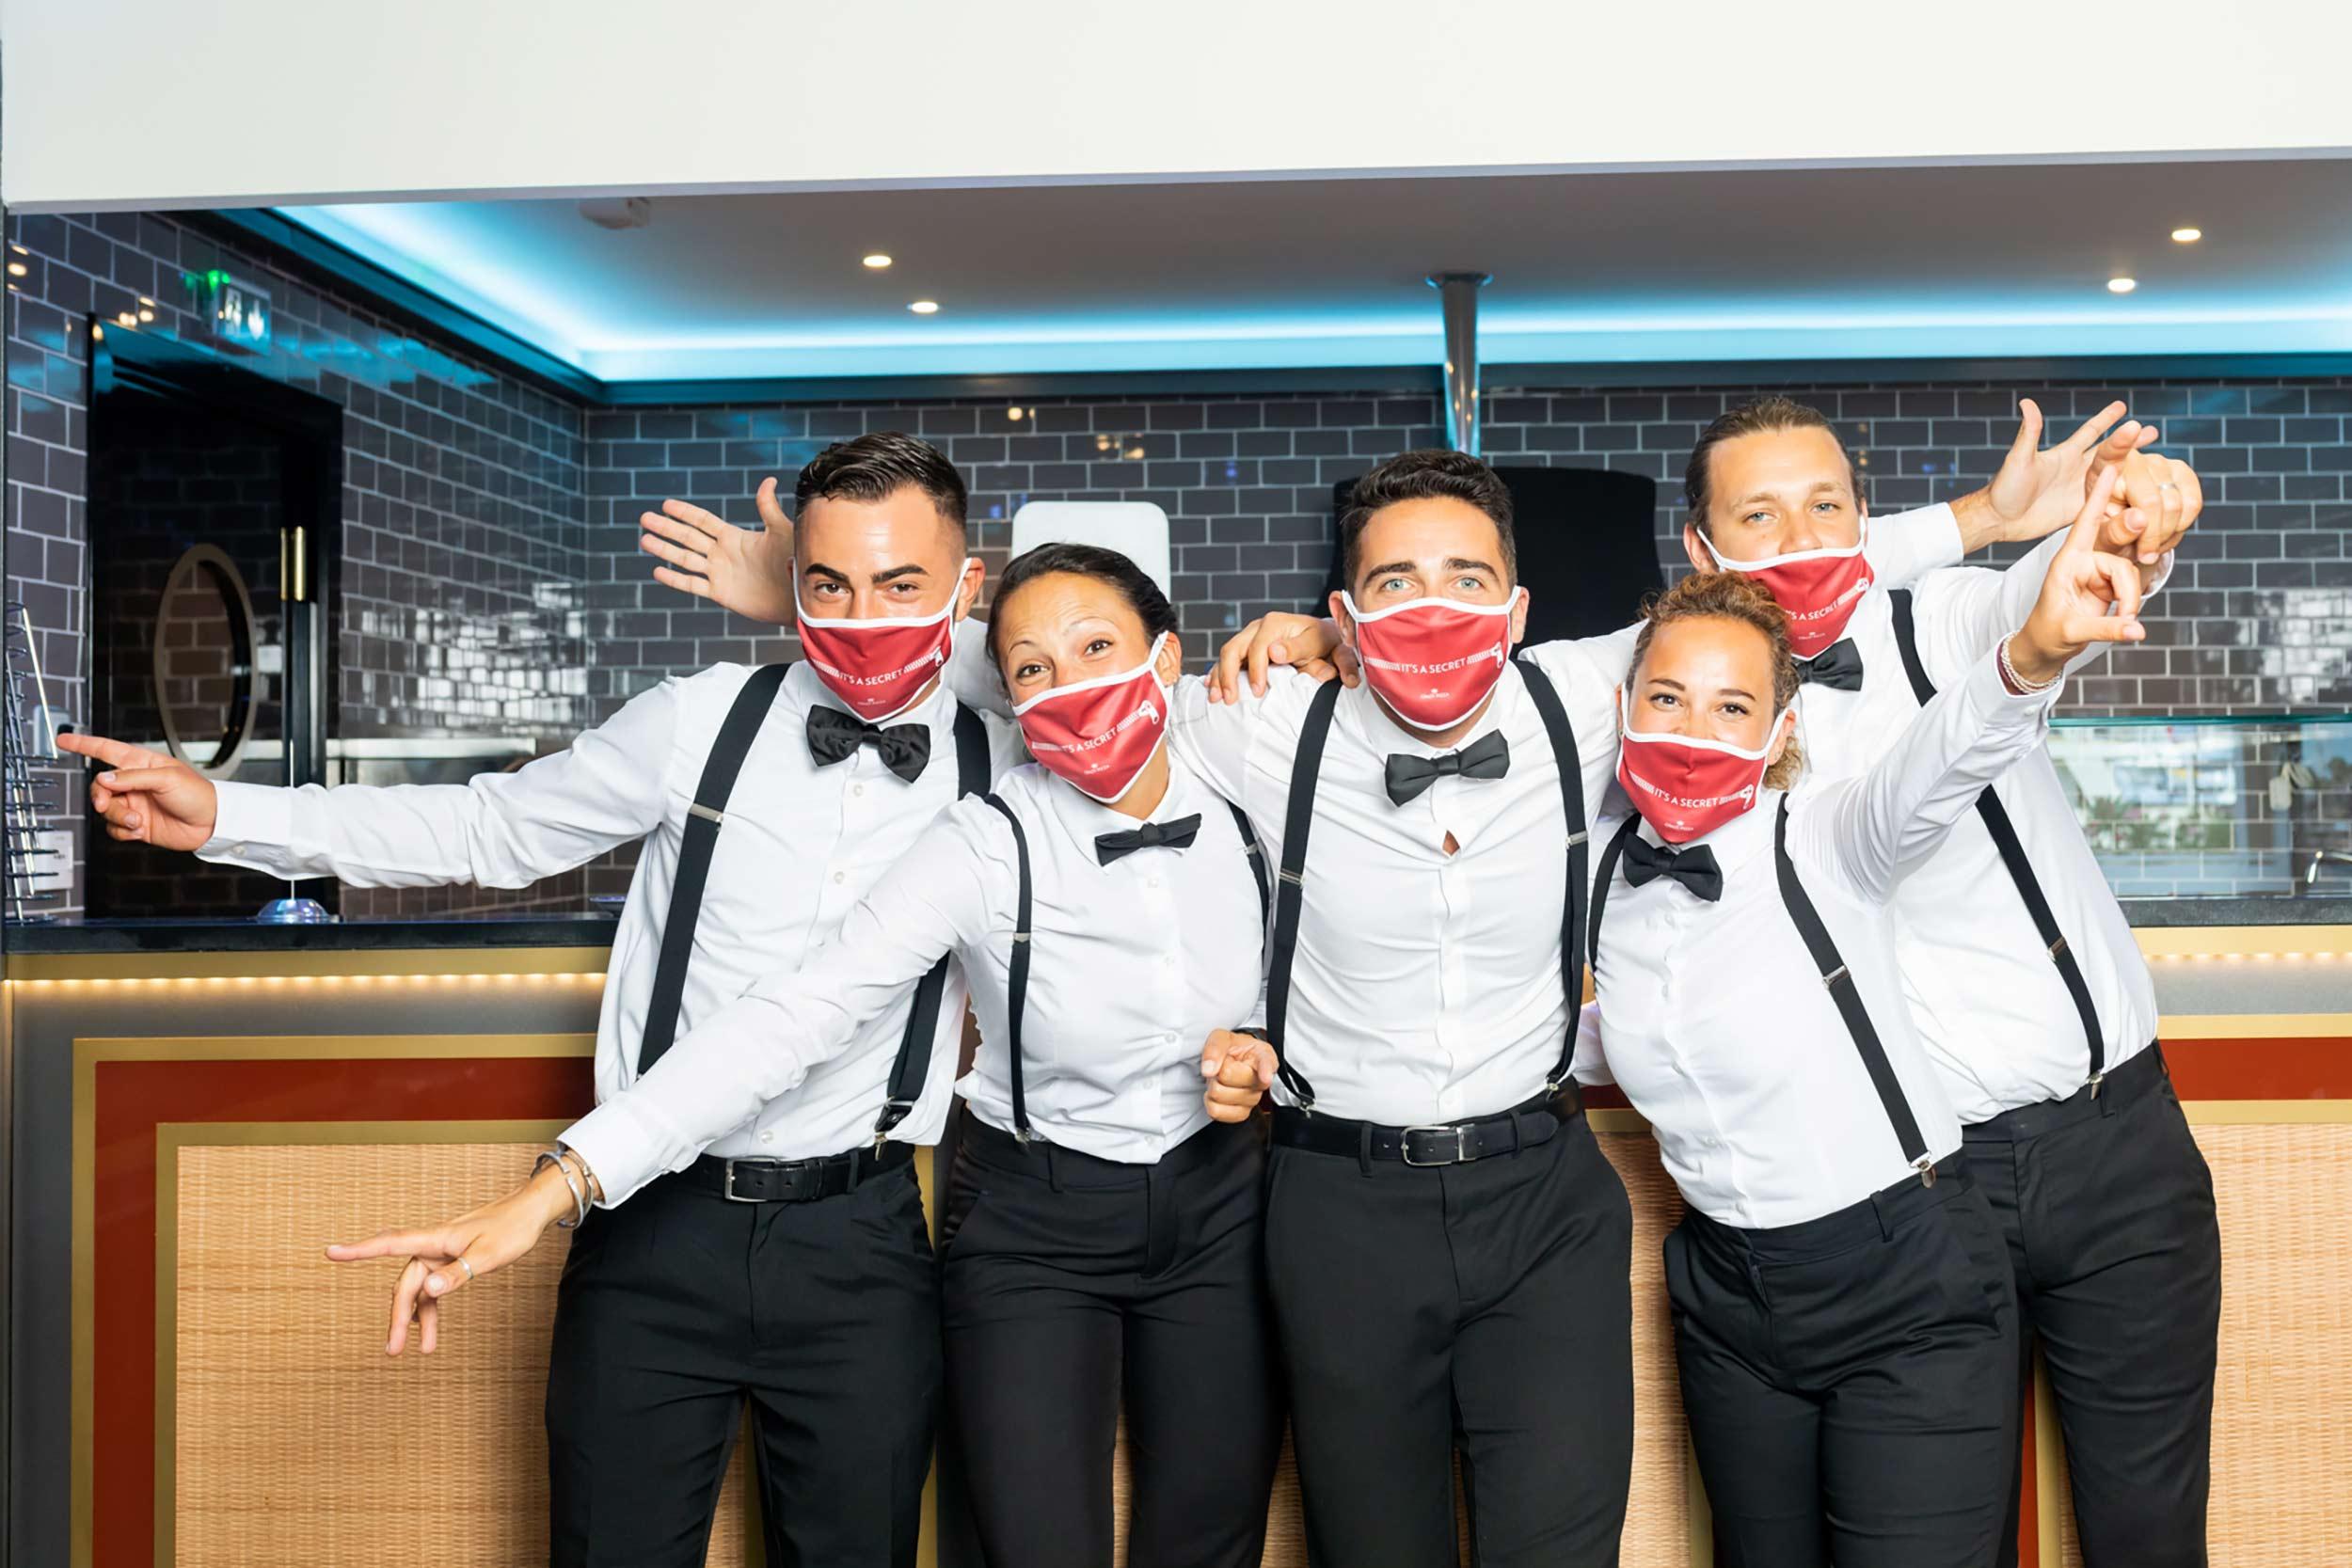 Group photo of waiters.